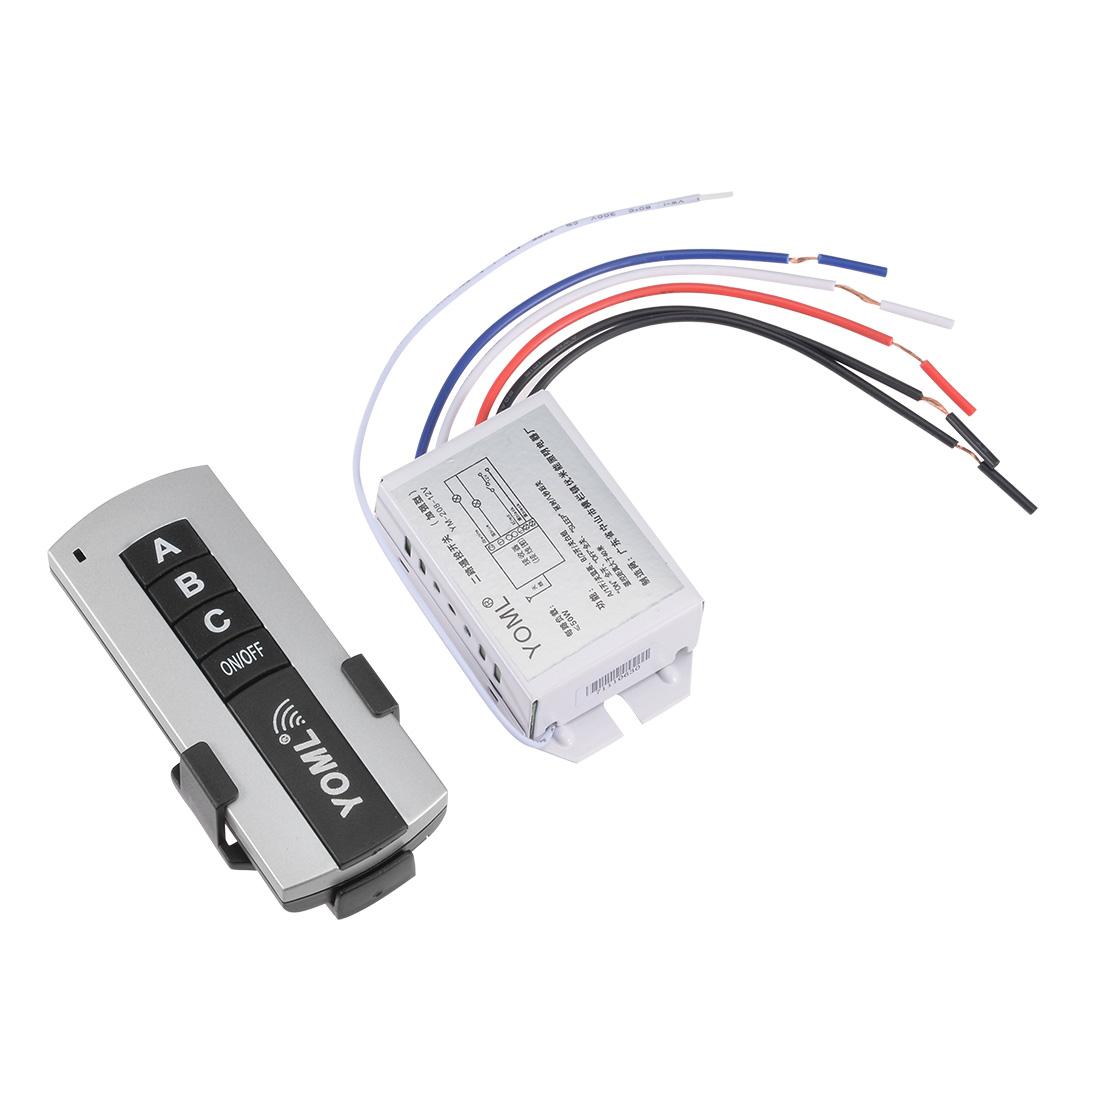 Home Lighting DC 12V 2 Port Wireless Digital RF Remote Control Lamp Switch